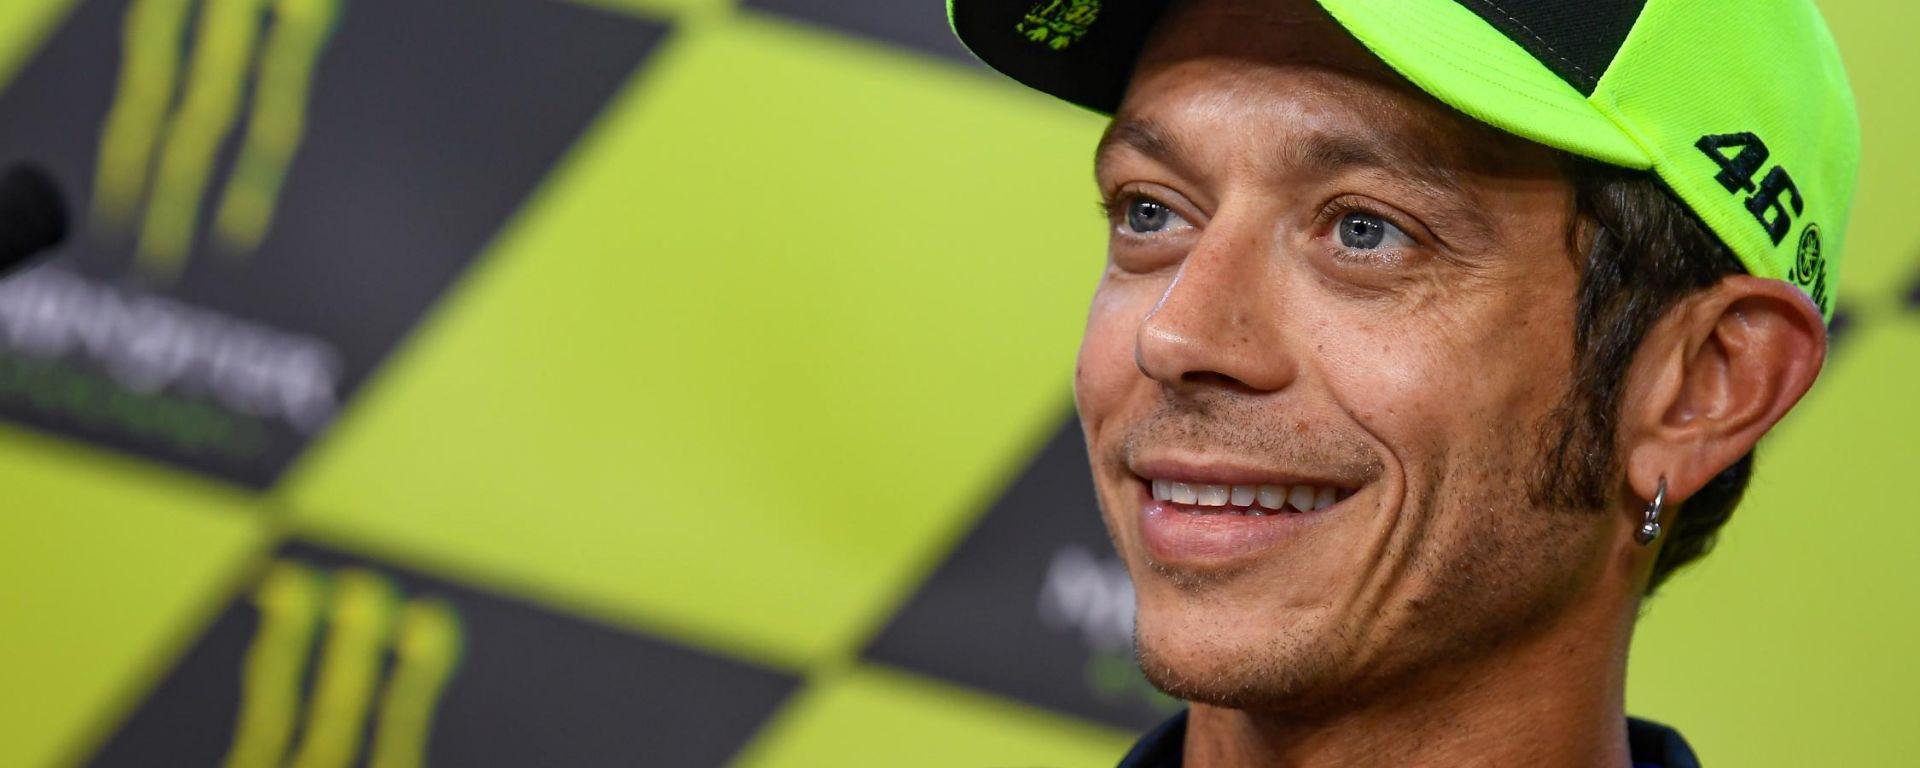 GP Rep. Ceca 2019, Brno, Valentino Rossi (Yamaha)